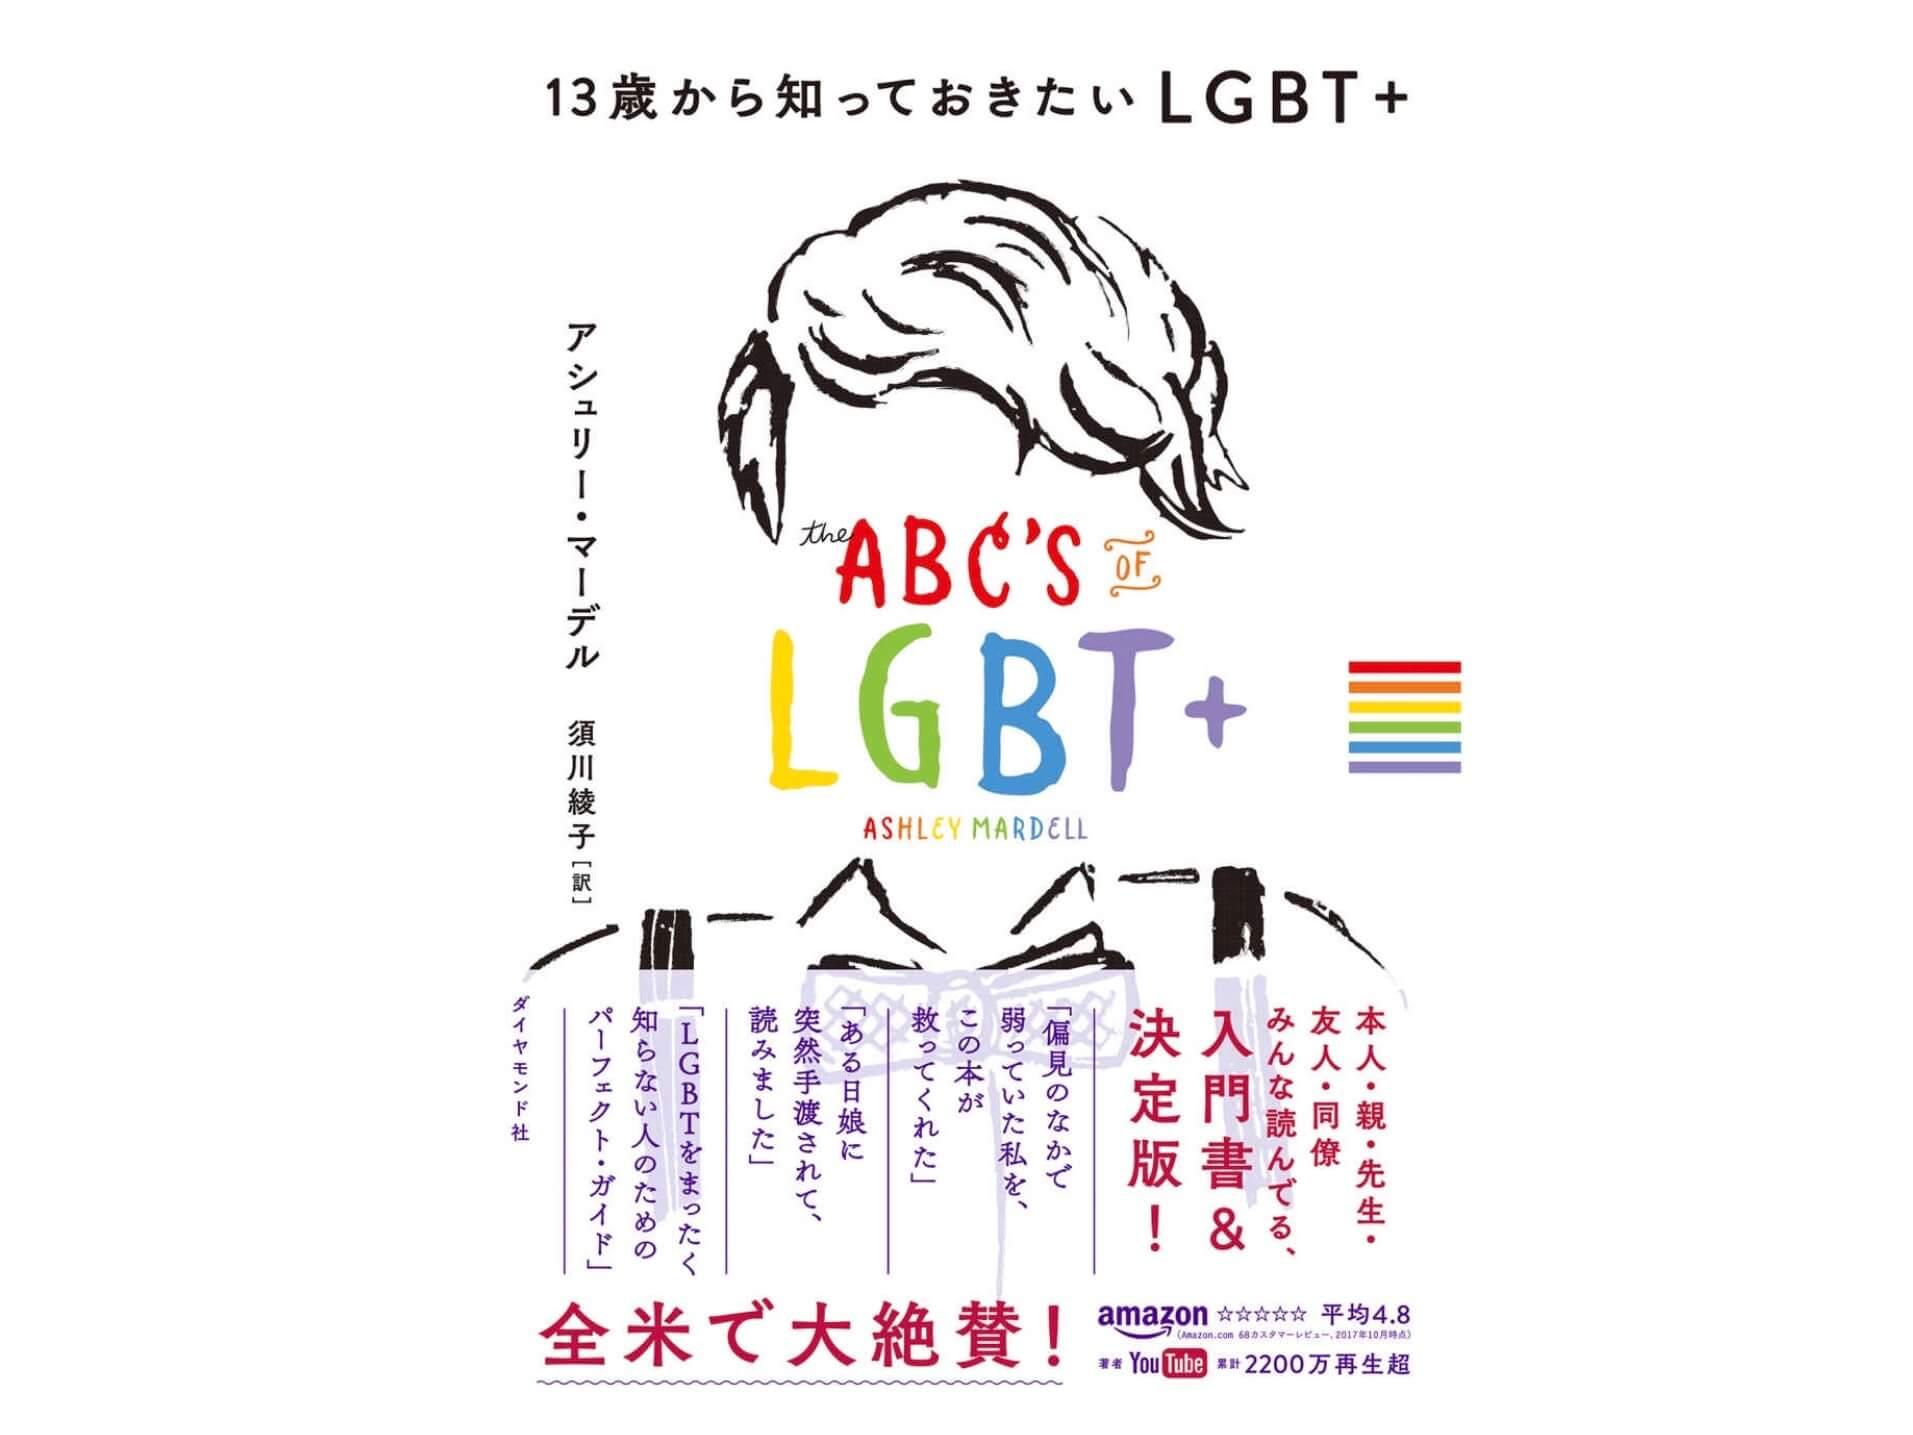 LGBT 用語